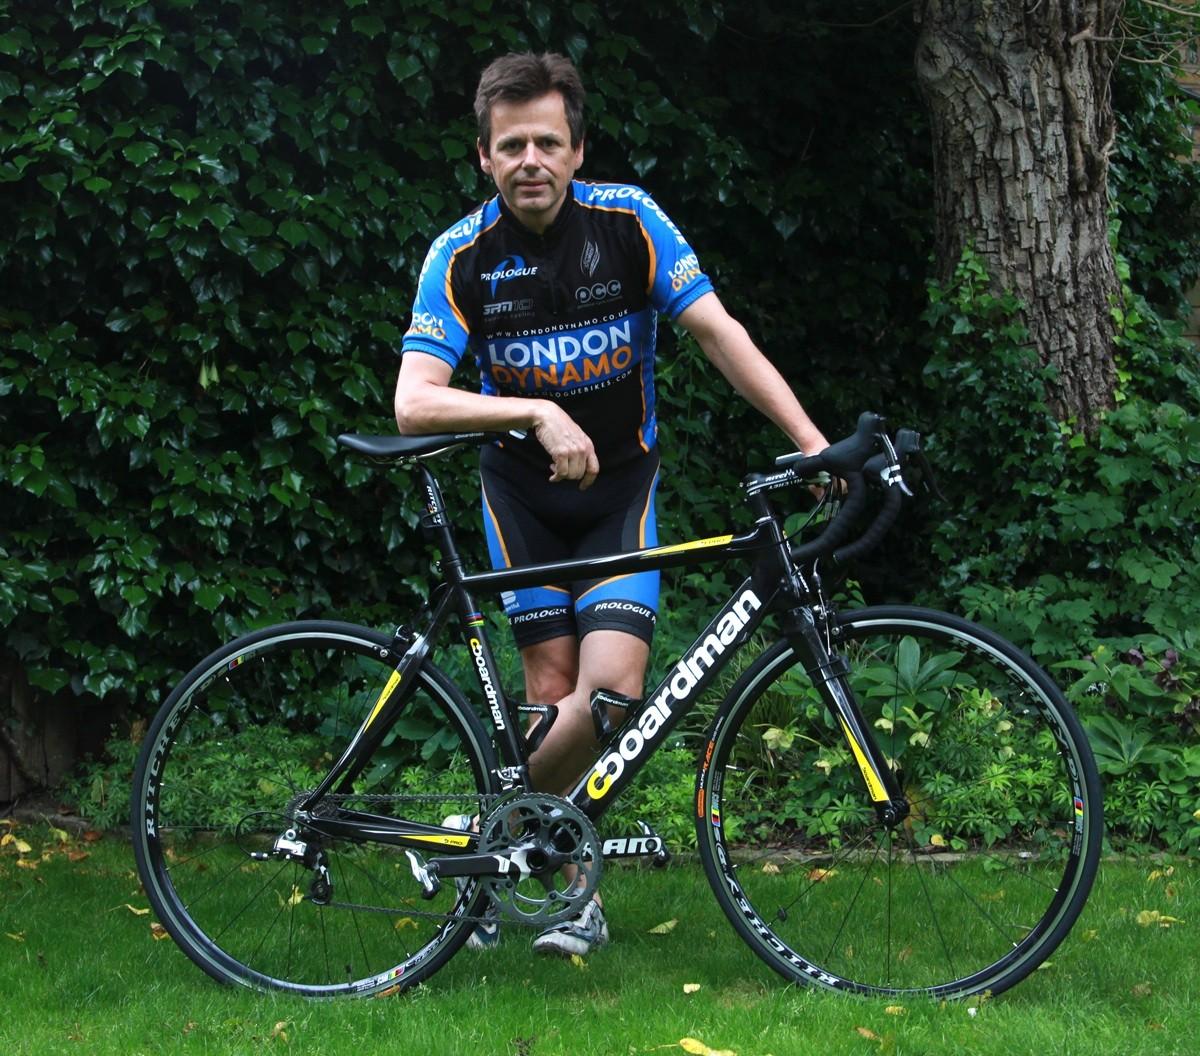 Nigel Smith – Ride Across Britain finisher!